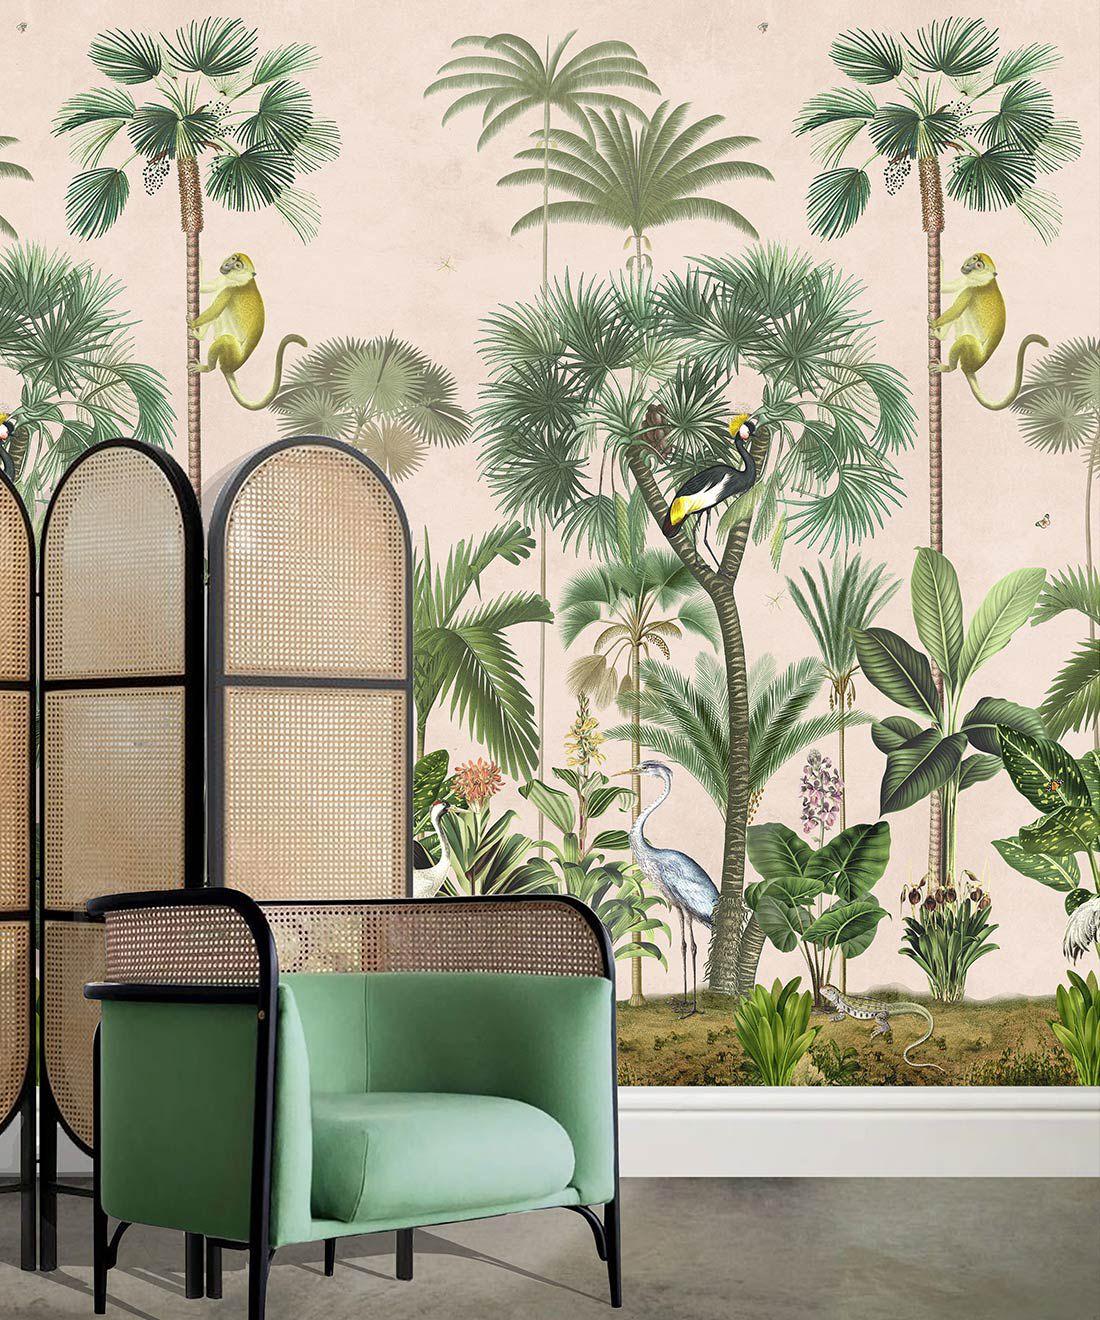 Indian Summer Wallpaper Mural •Bethany Linz • Palm Tree Mural • Pink • Insitu